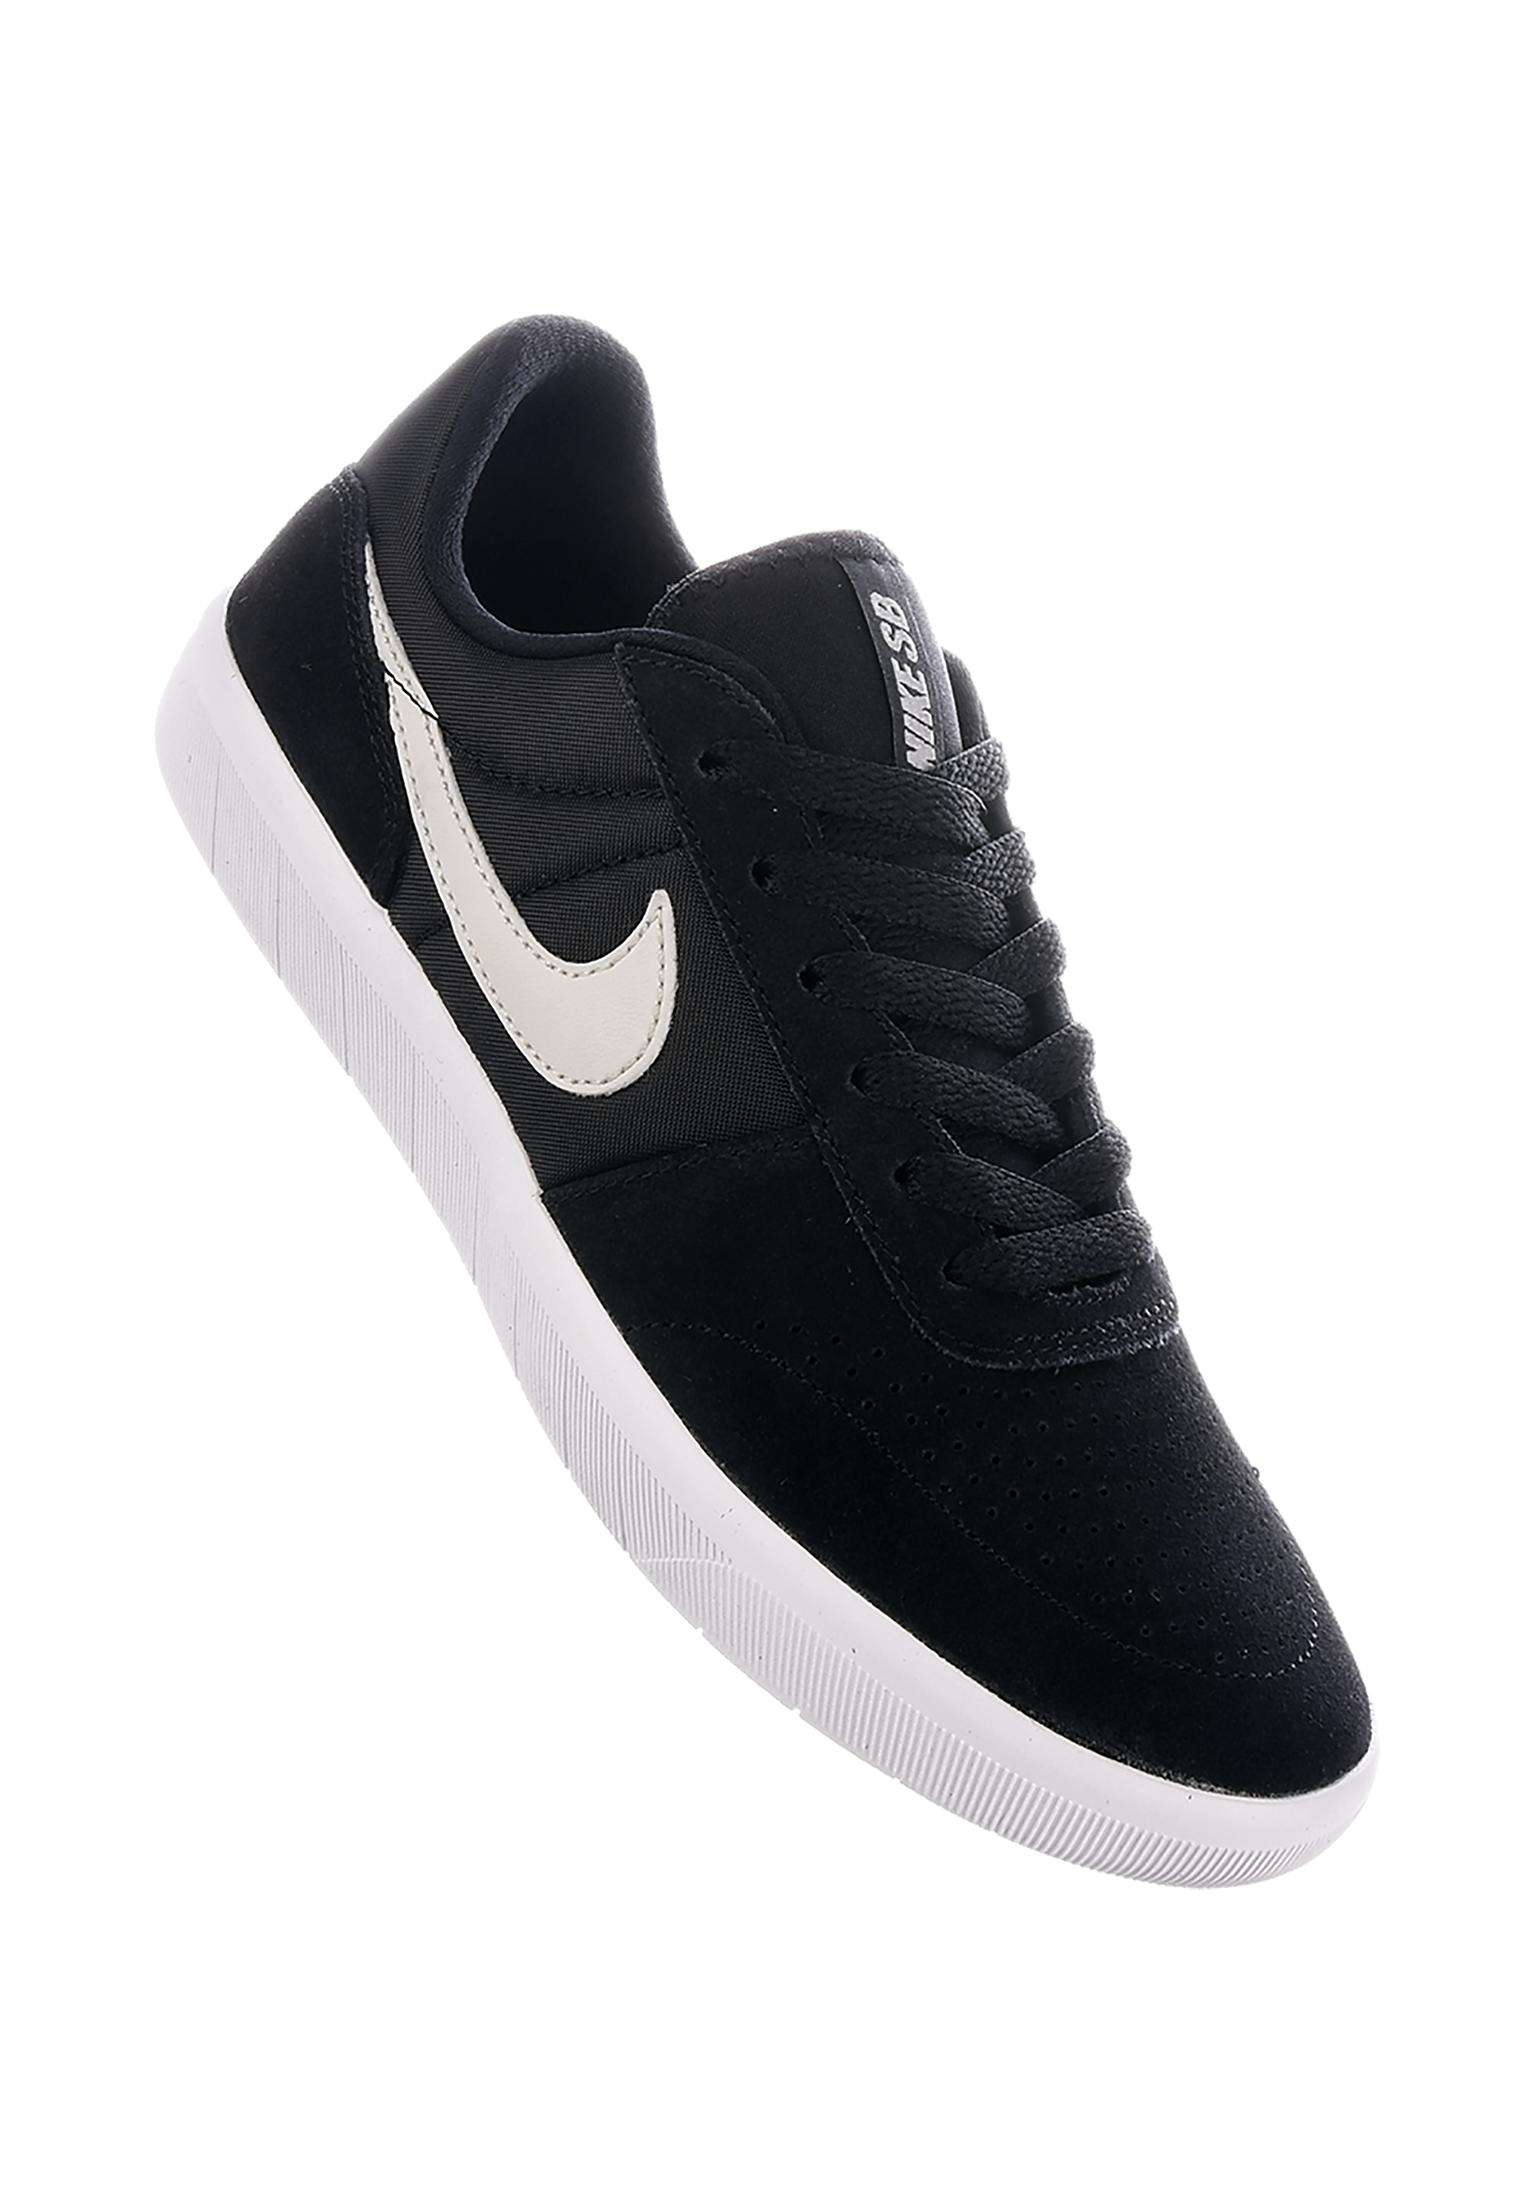 detailed look 40995 1829a Team Classic Nike SB Alle Schuhe in black-lightbone-white für Damen  Titus